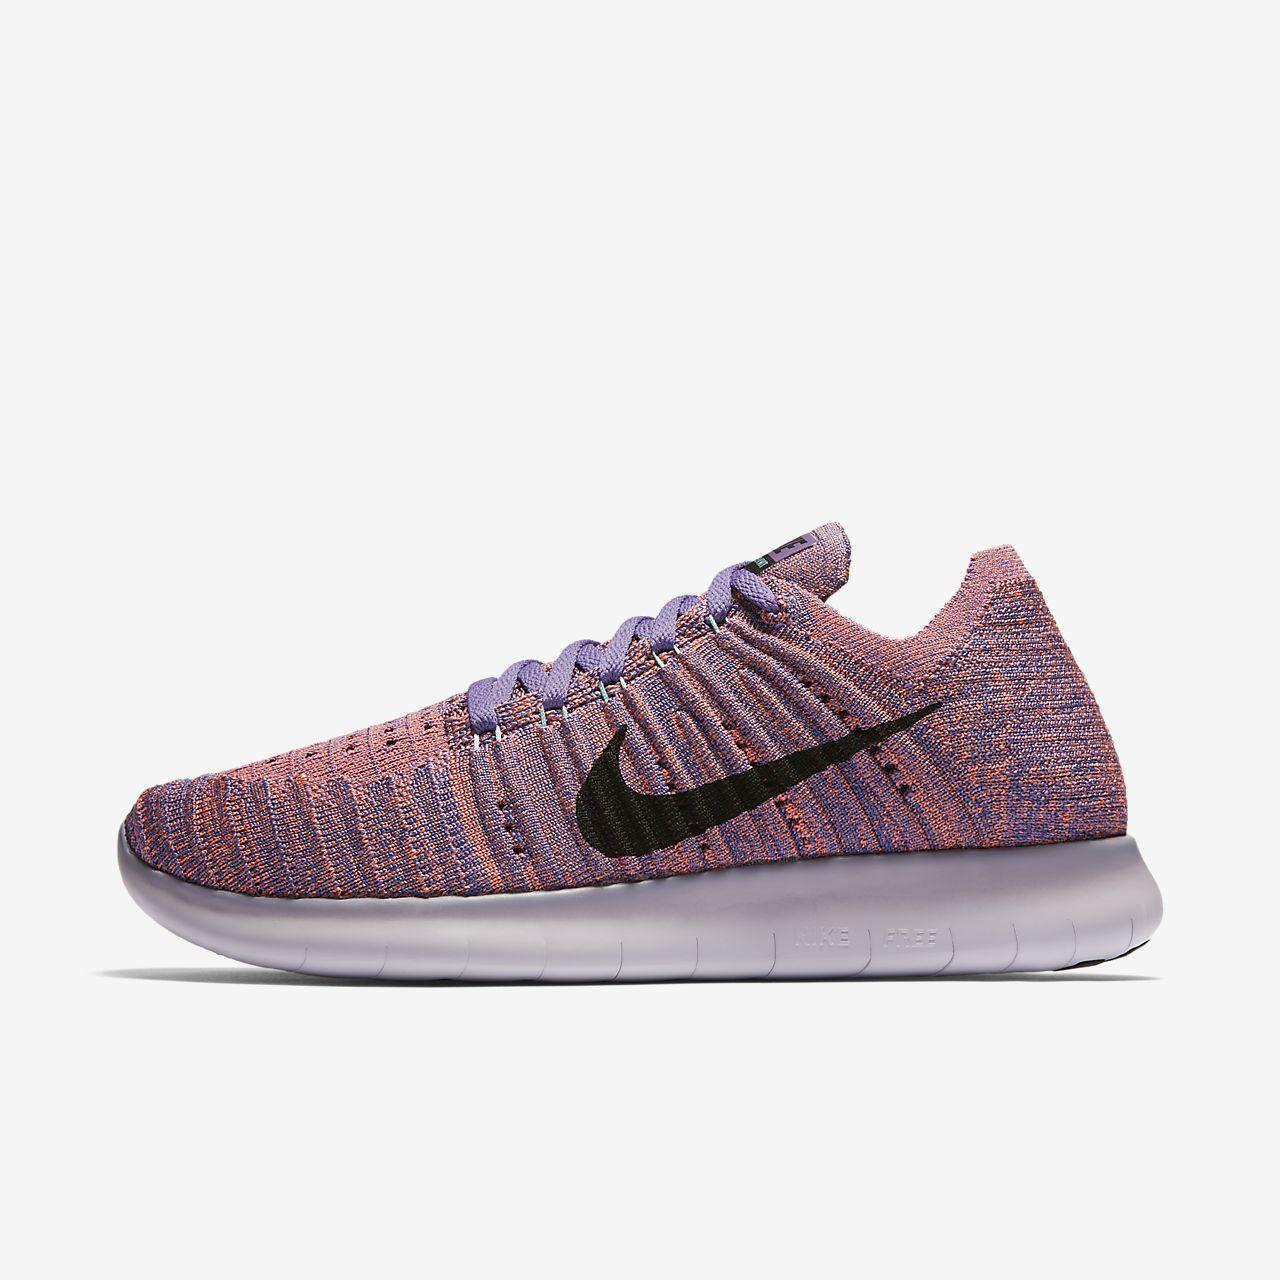 Nike Free RN Flyknit maron